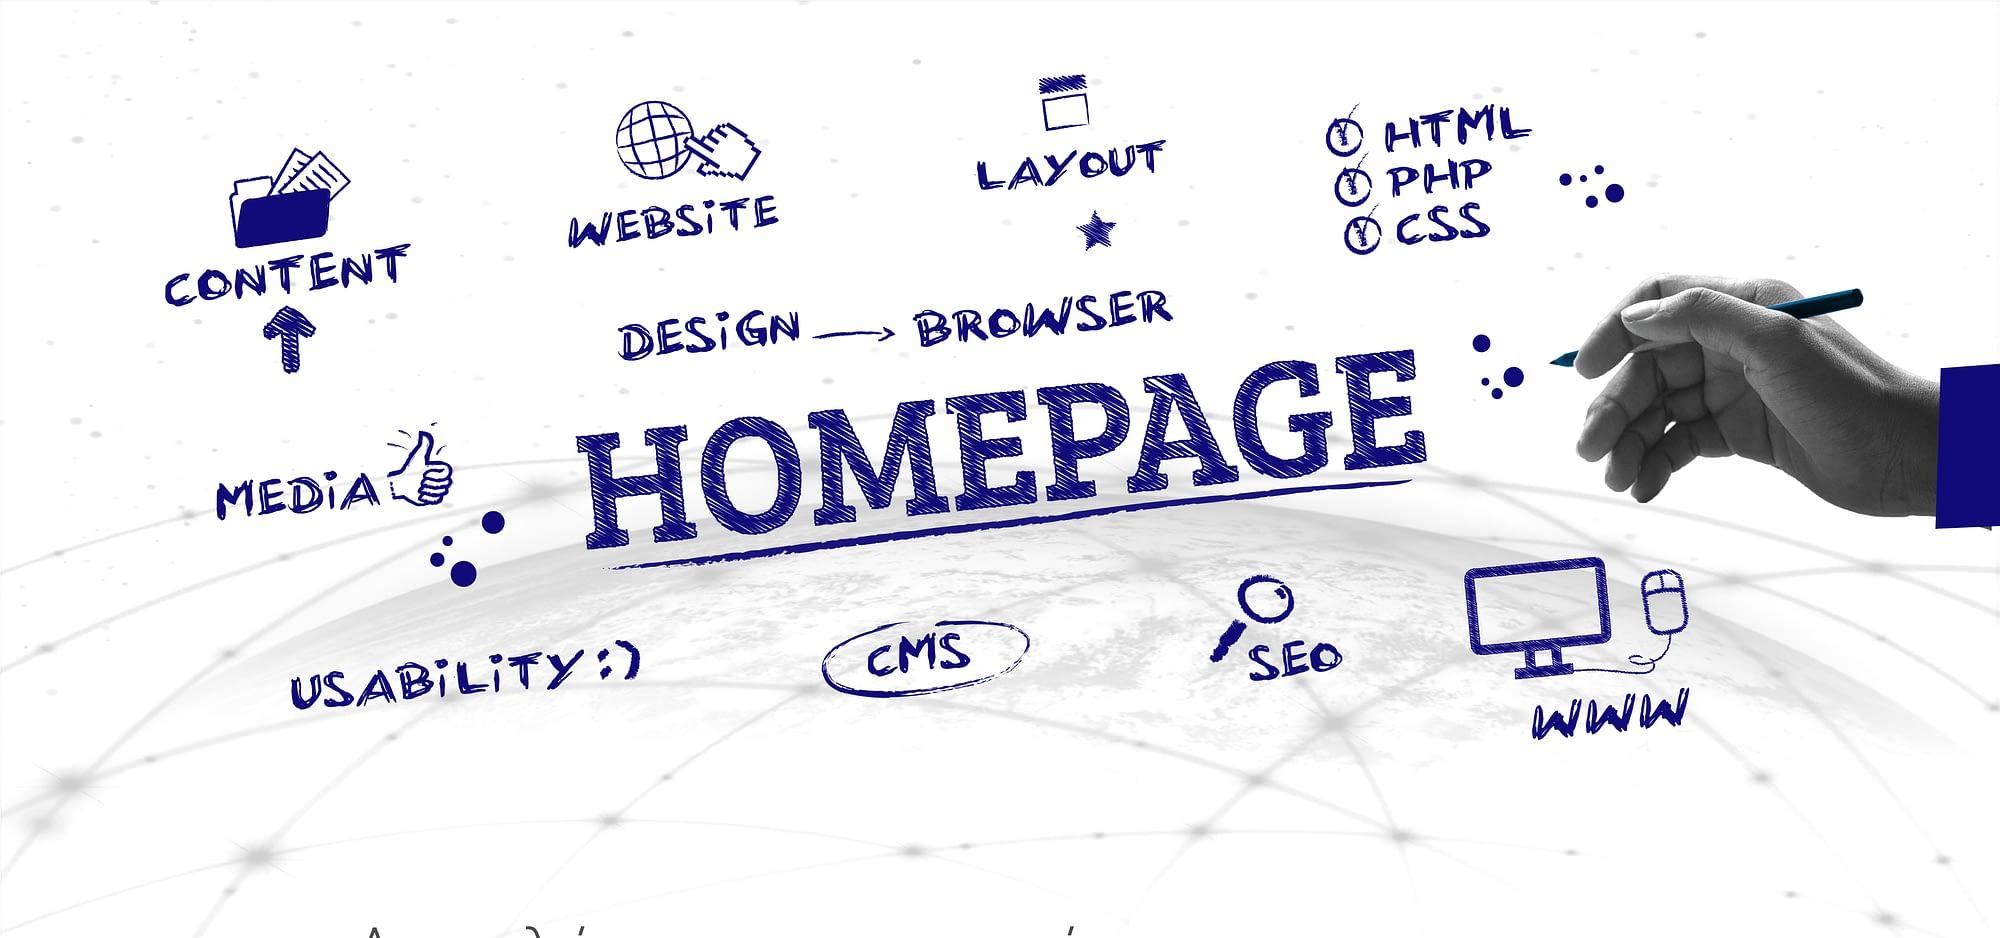 web design αρχικη - Κατασκευή ιστότοπων